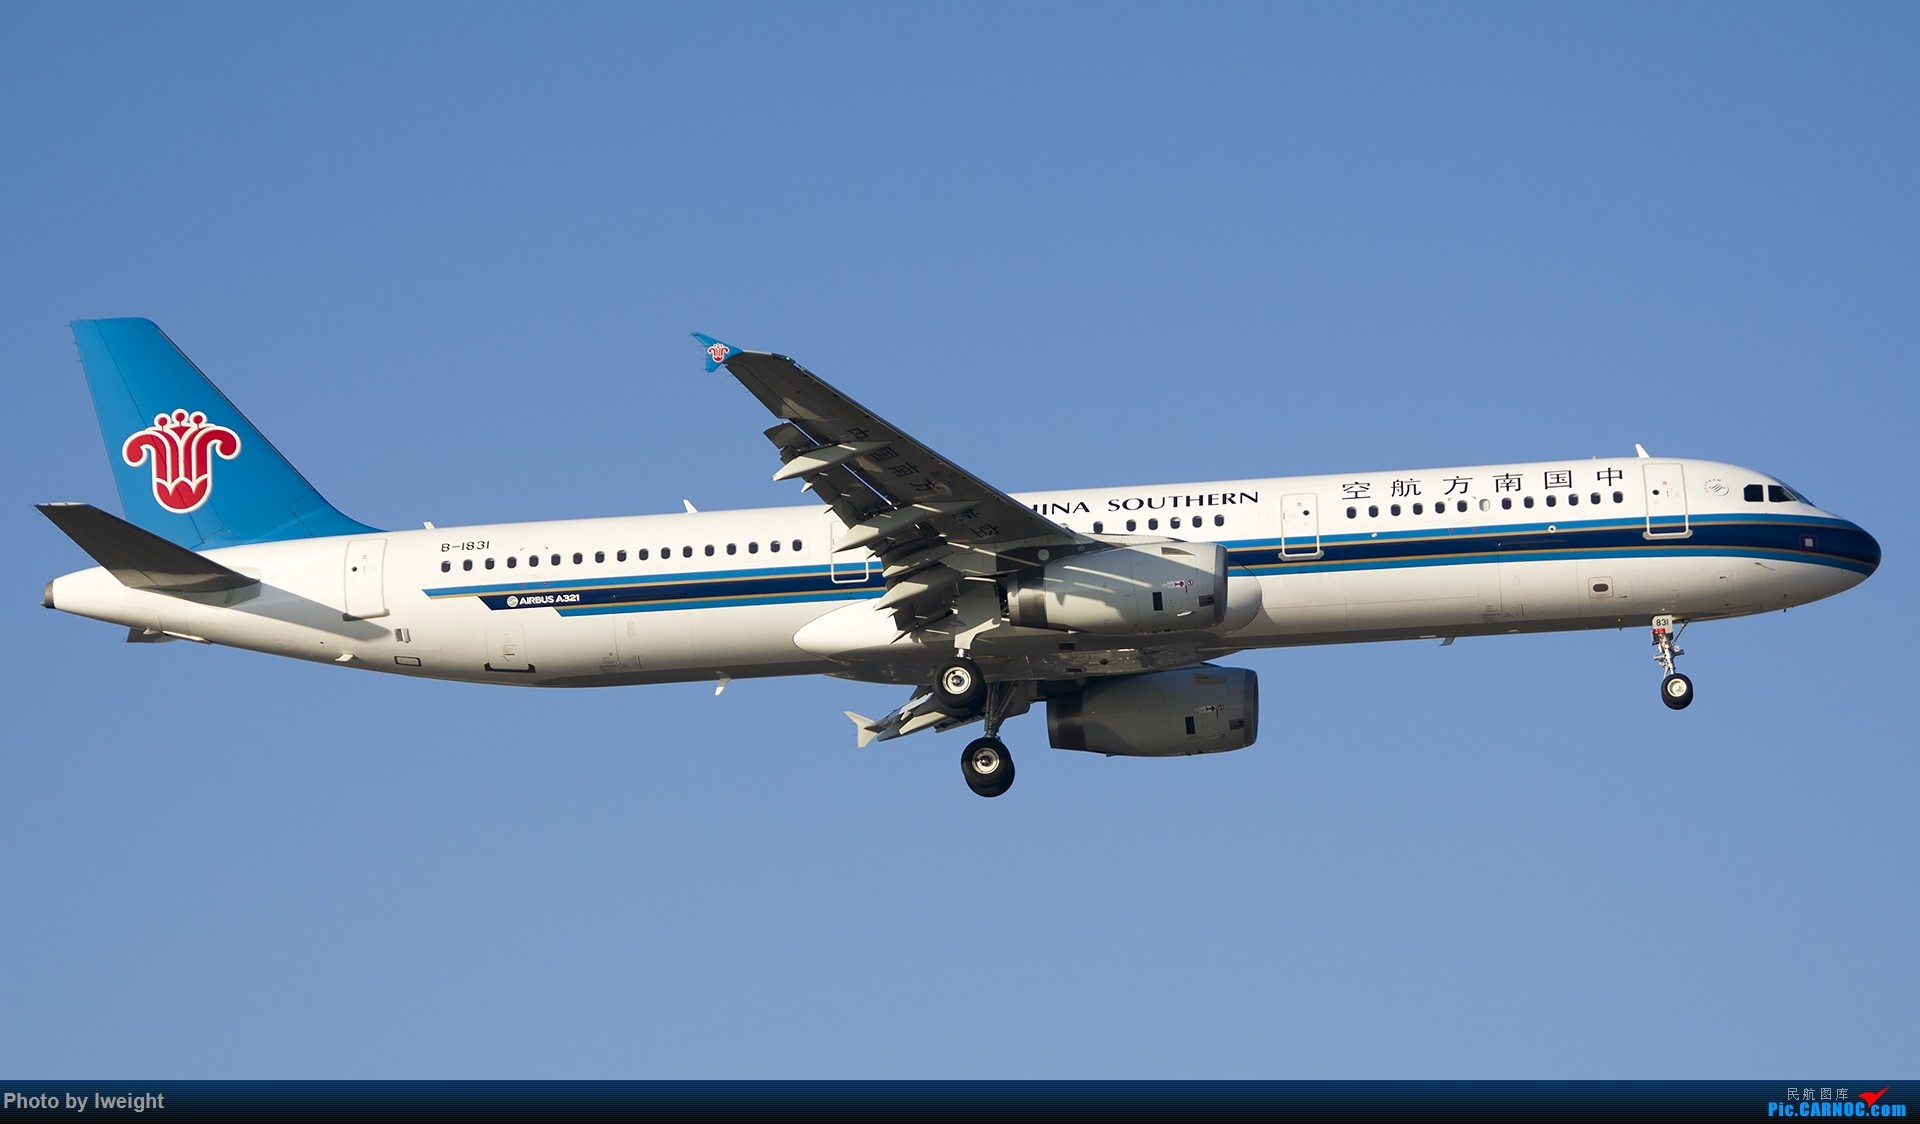 Re:[原创]庆祝升级777,发上今天在首都机场拍的所有飞机【2014-12-14】 AIRBUS A321-200 B-1831 中国北京首都国际机场